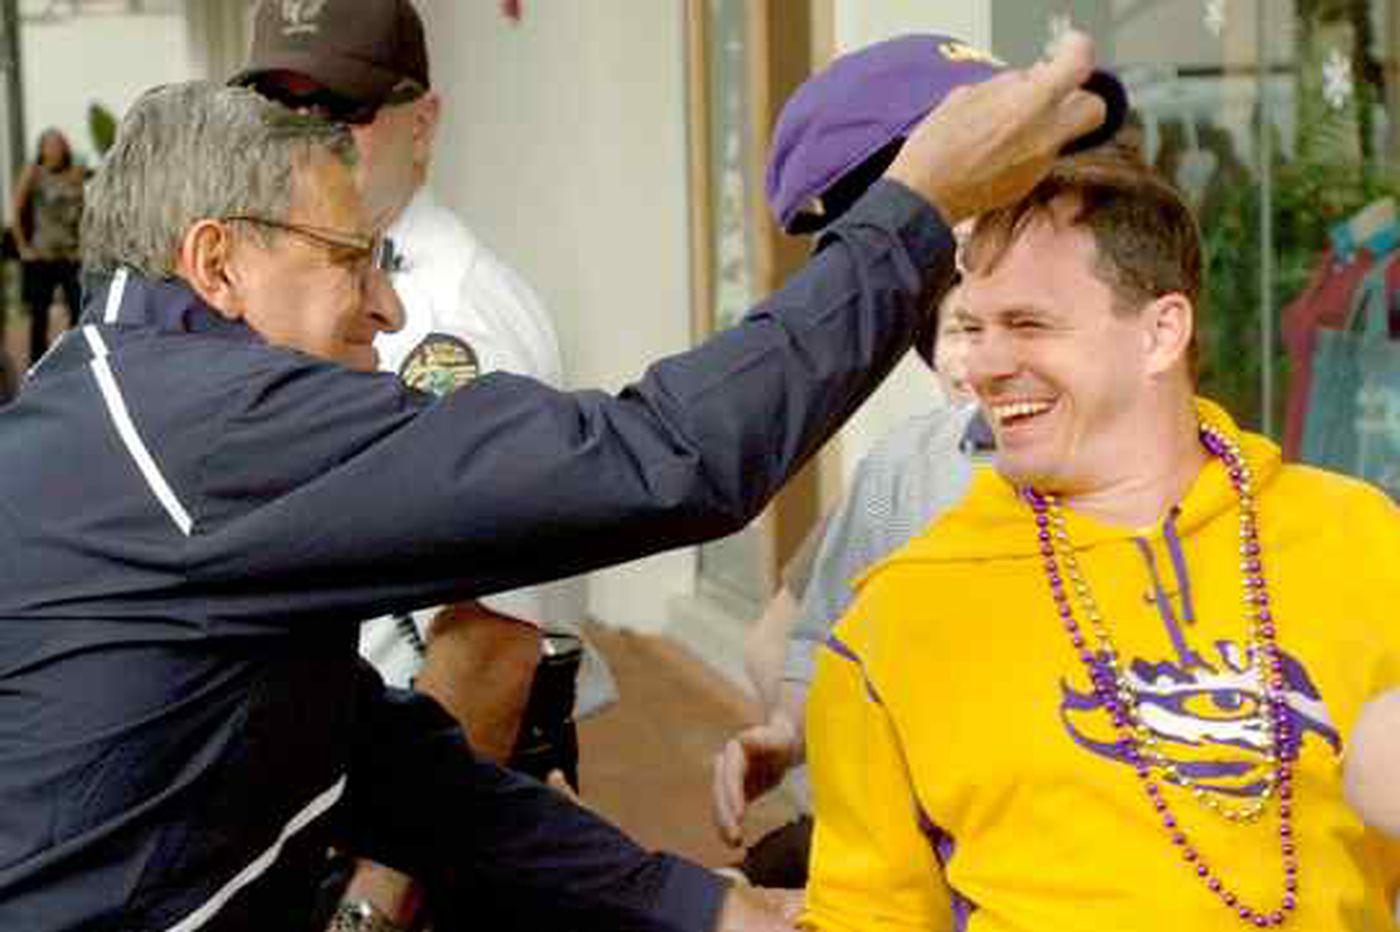 Penn State's Lee balances fun and work